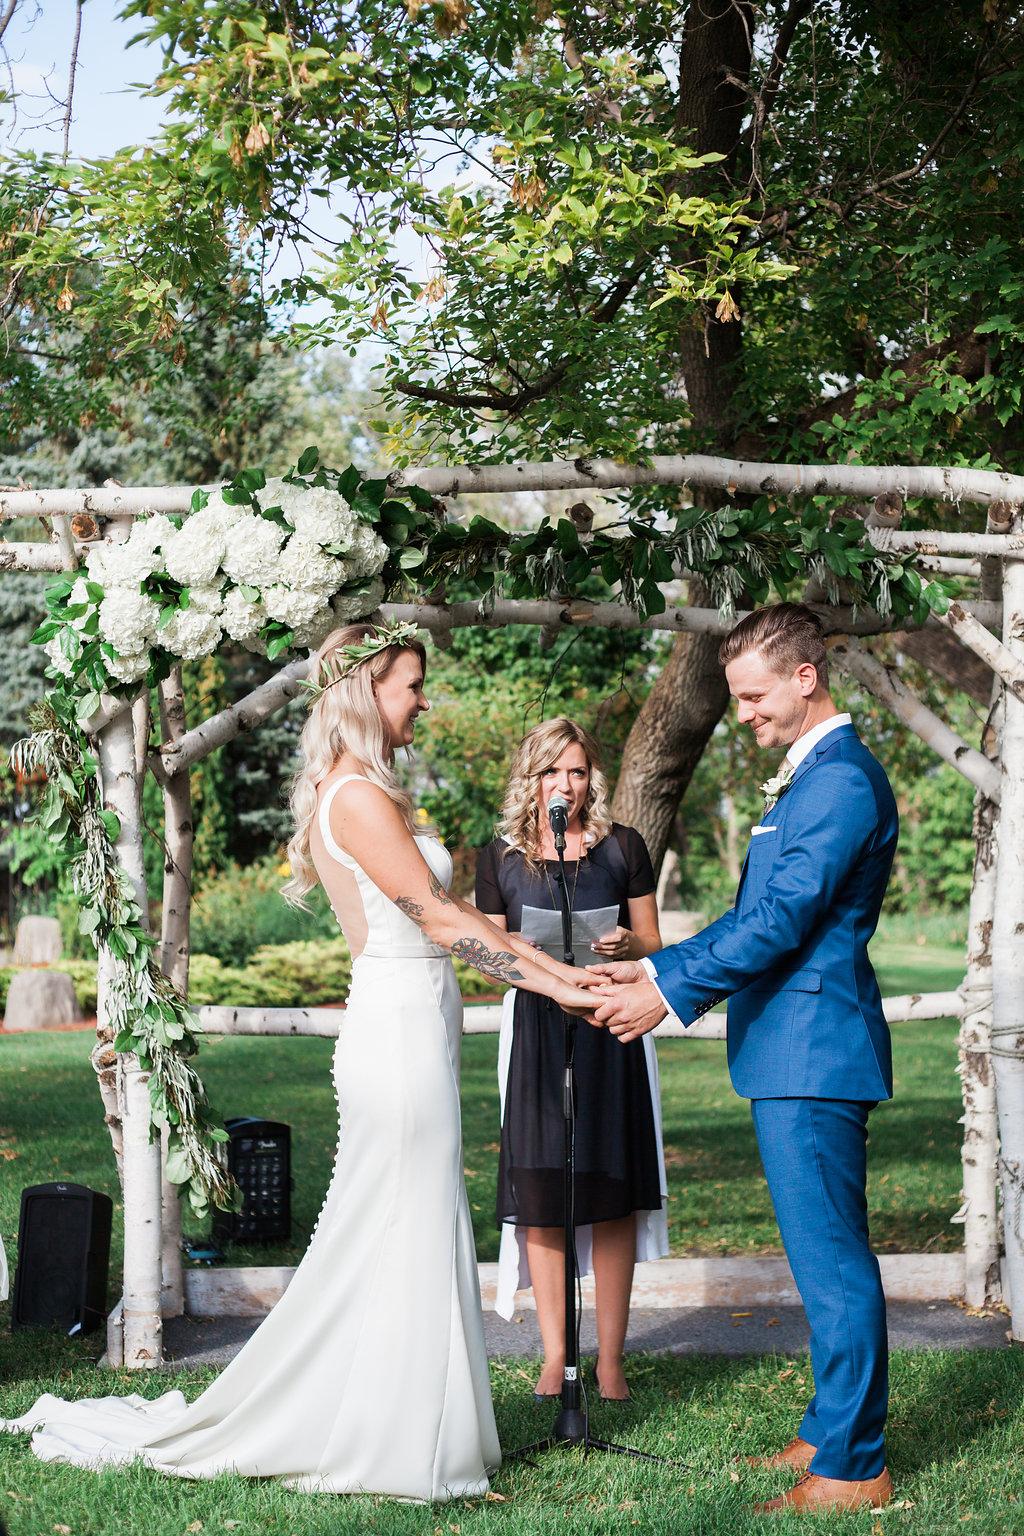 Evergreen Village Wedding - Outdoor Wedding Ceremony